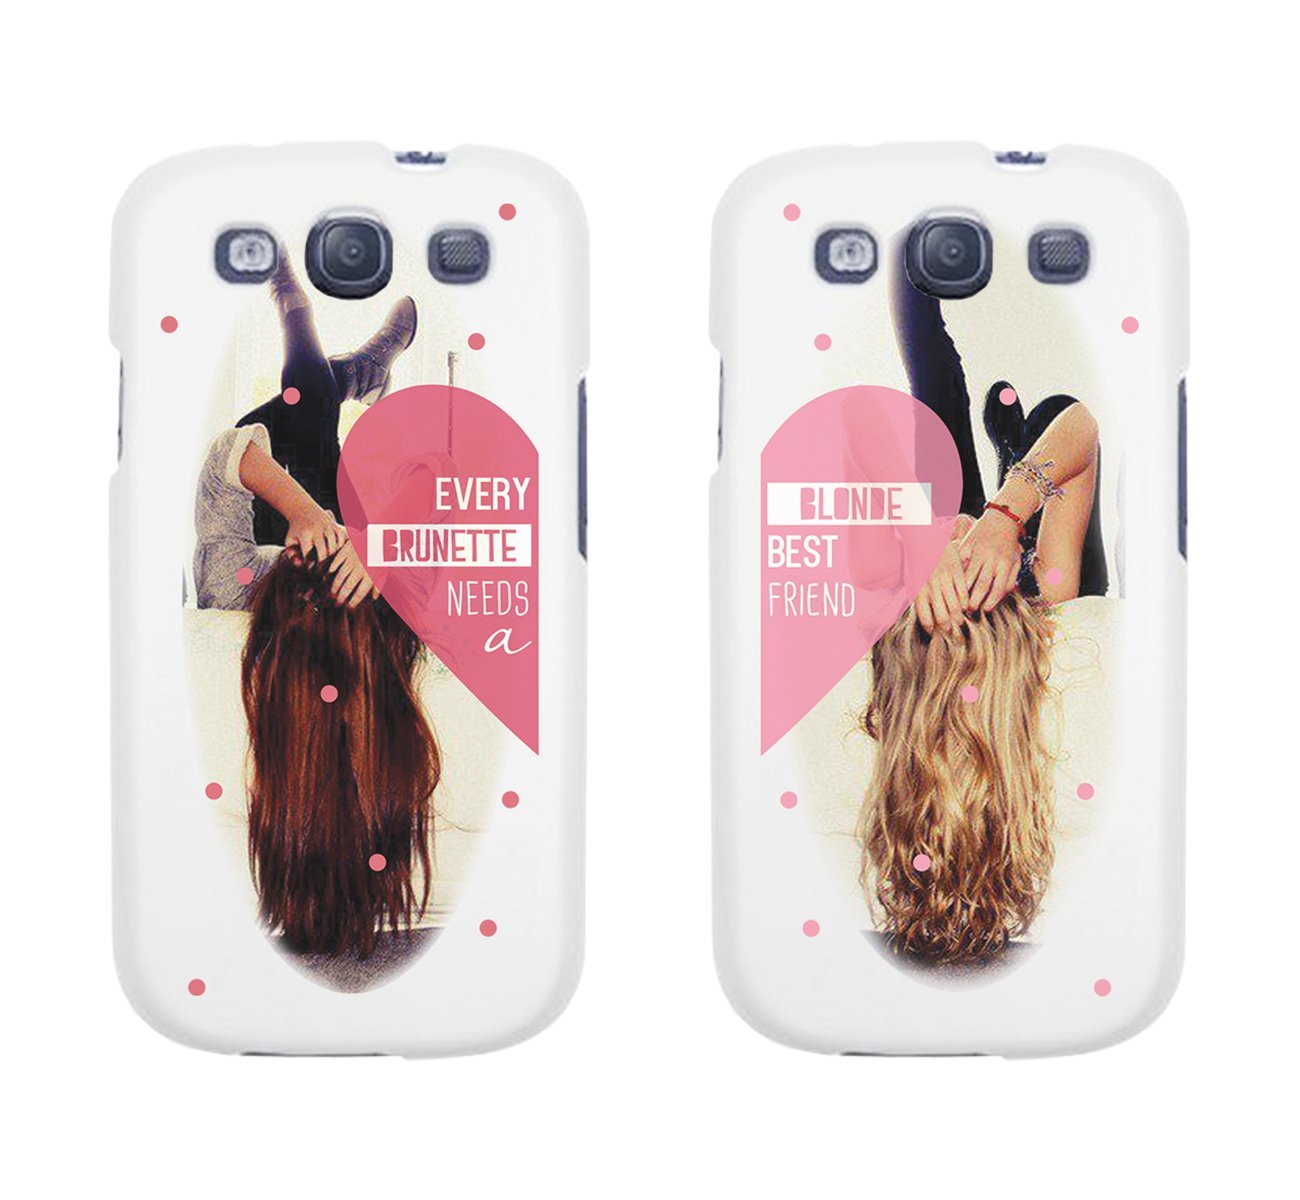 best cheap af4de 8b806 Amazon.com: Every Brunette Needs a Blonde Best Friend BFF Phone Cases for  iphone 4, iphone 5, iphone 5C, iphone 6, iphone 6 plus, Galaxy S3, Galaxy  ...